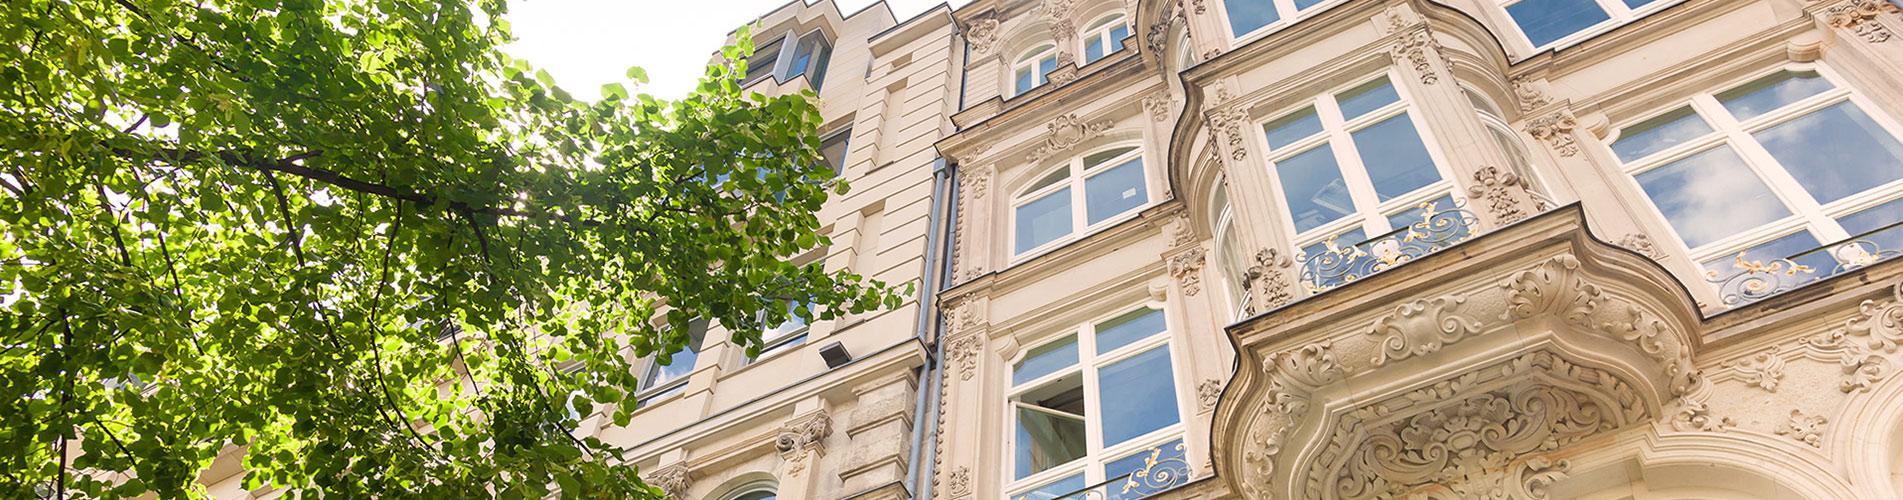 investissement-immobilier-loi-malraux